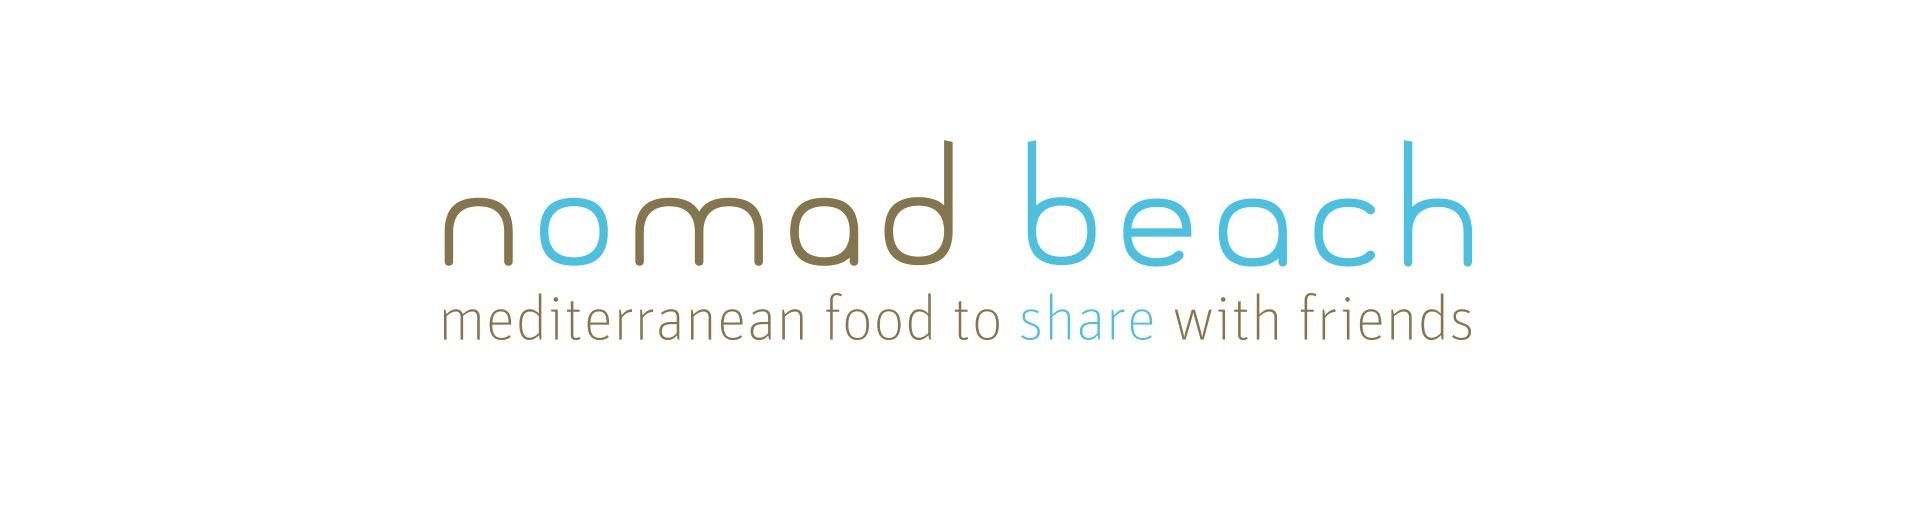 nomad-beach-logo